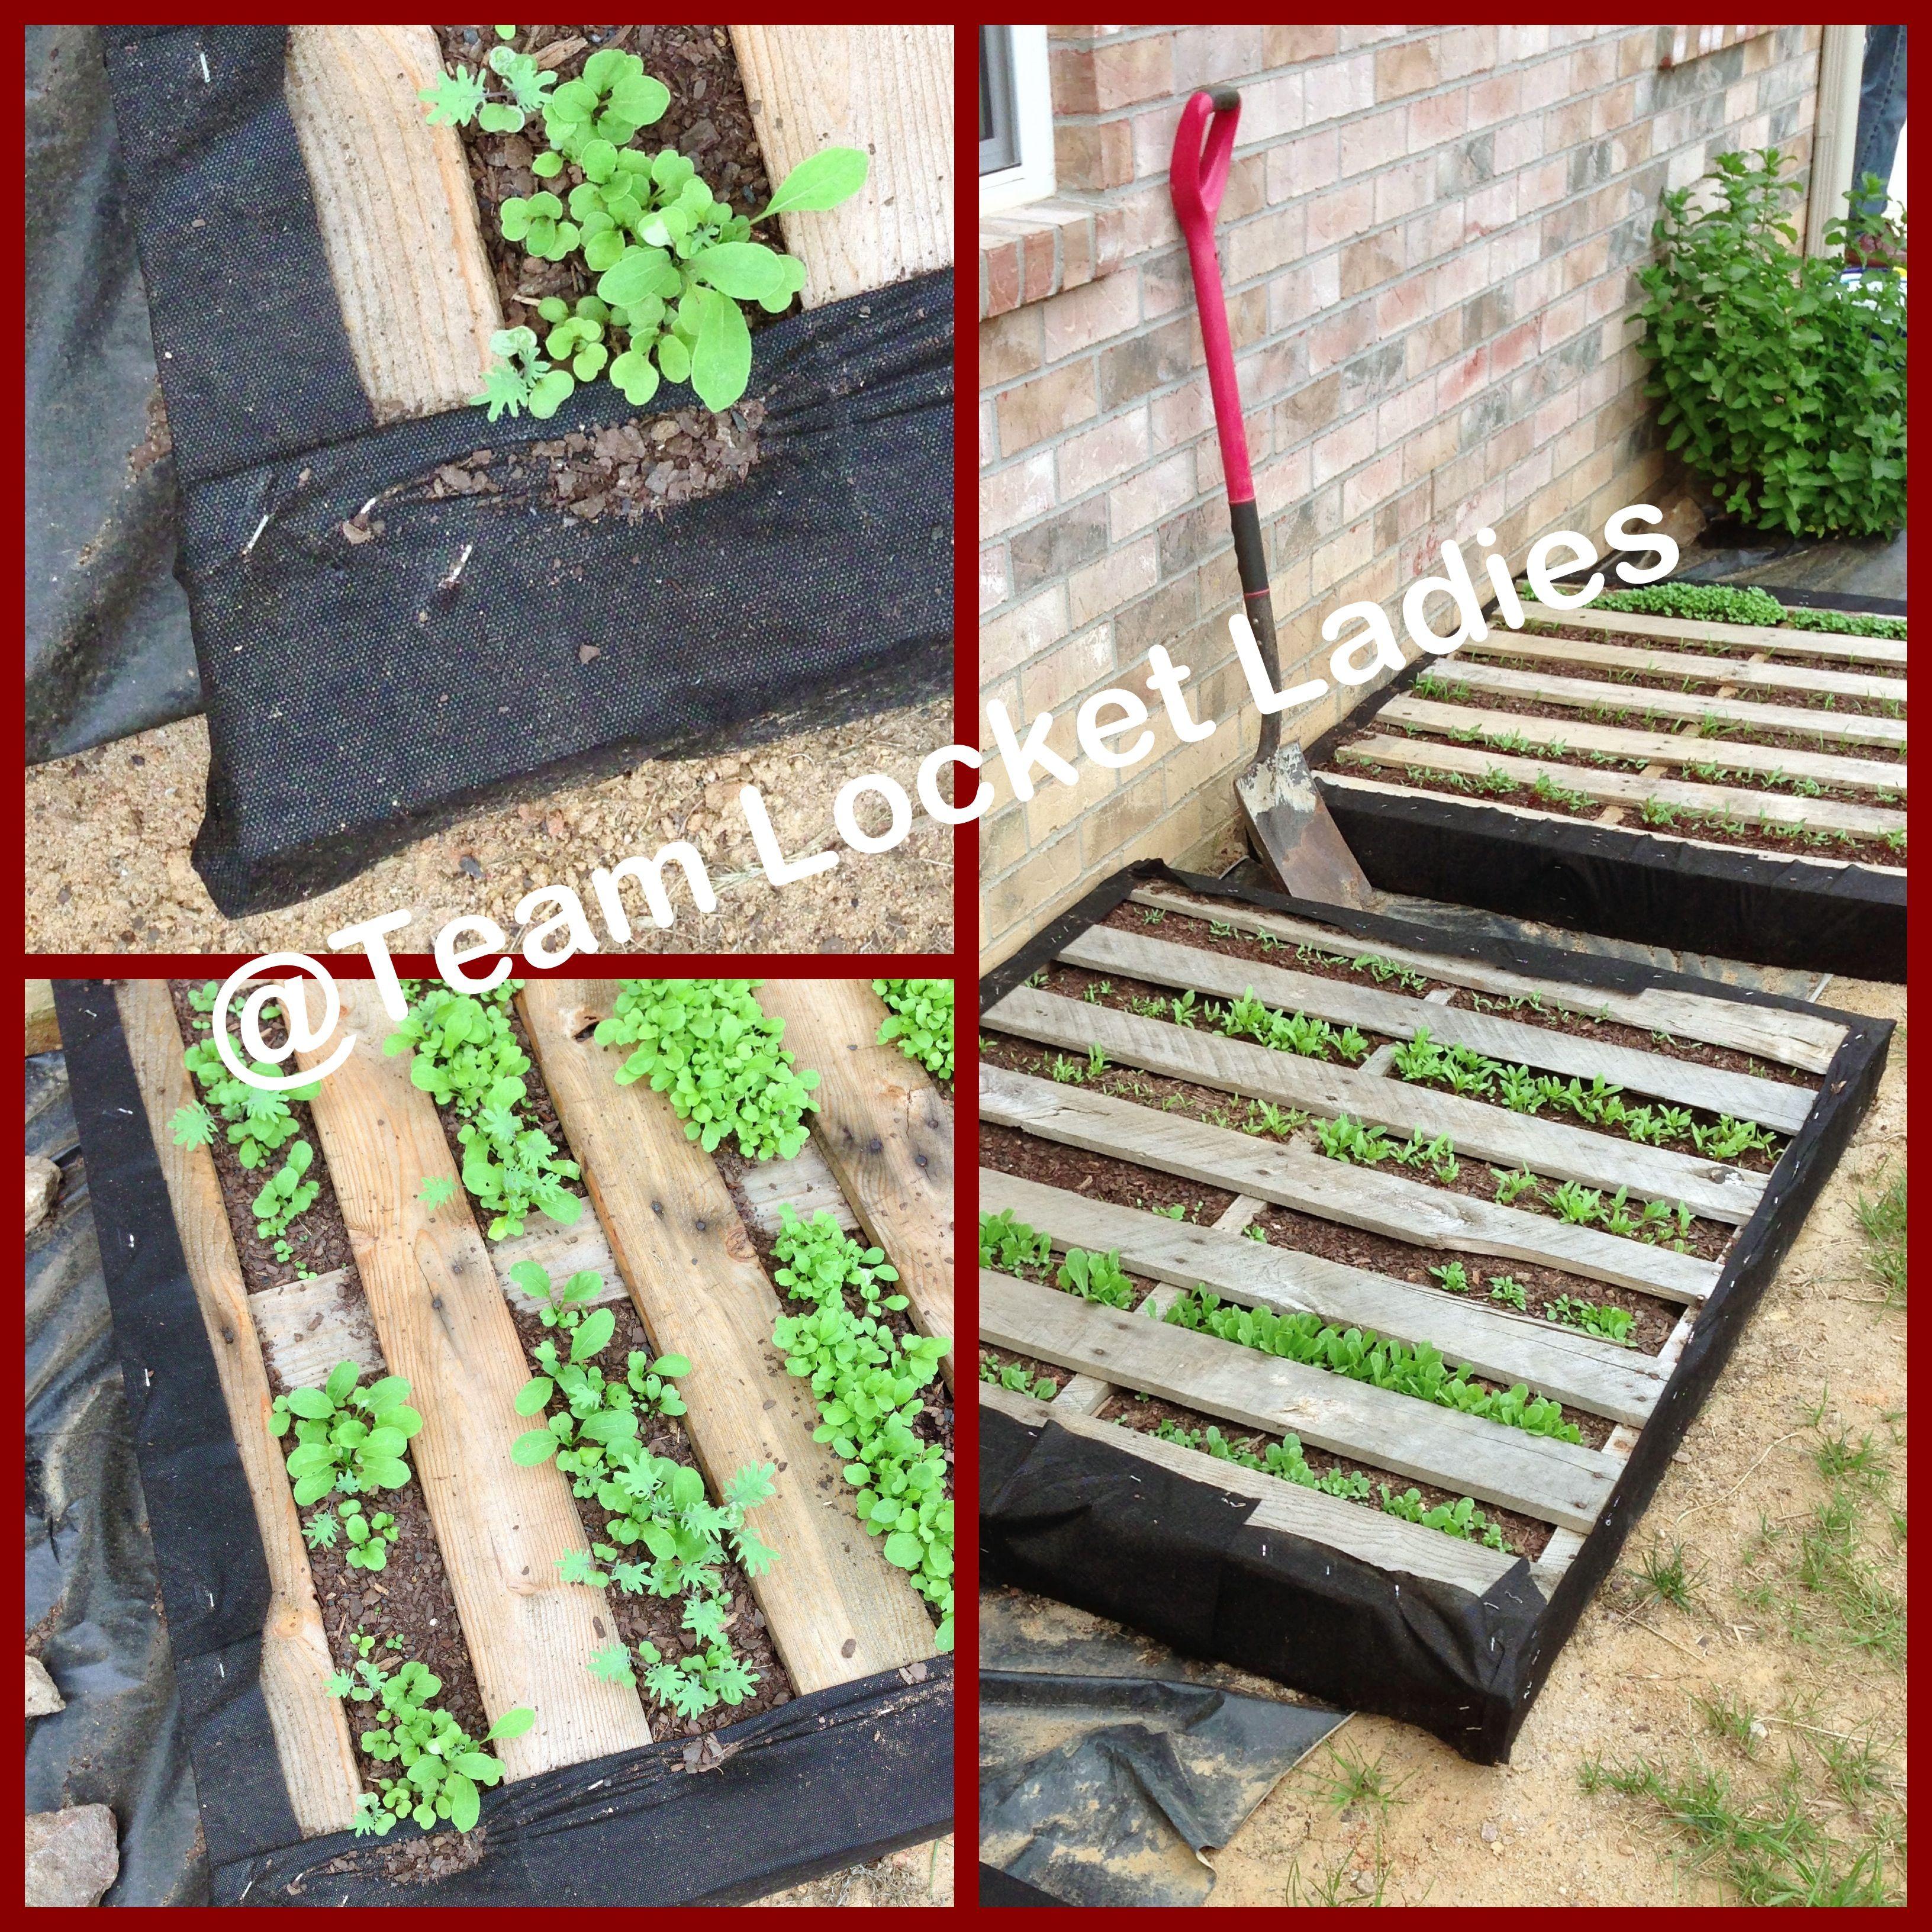 Pallet gardening for salad greens